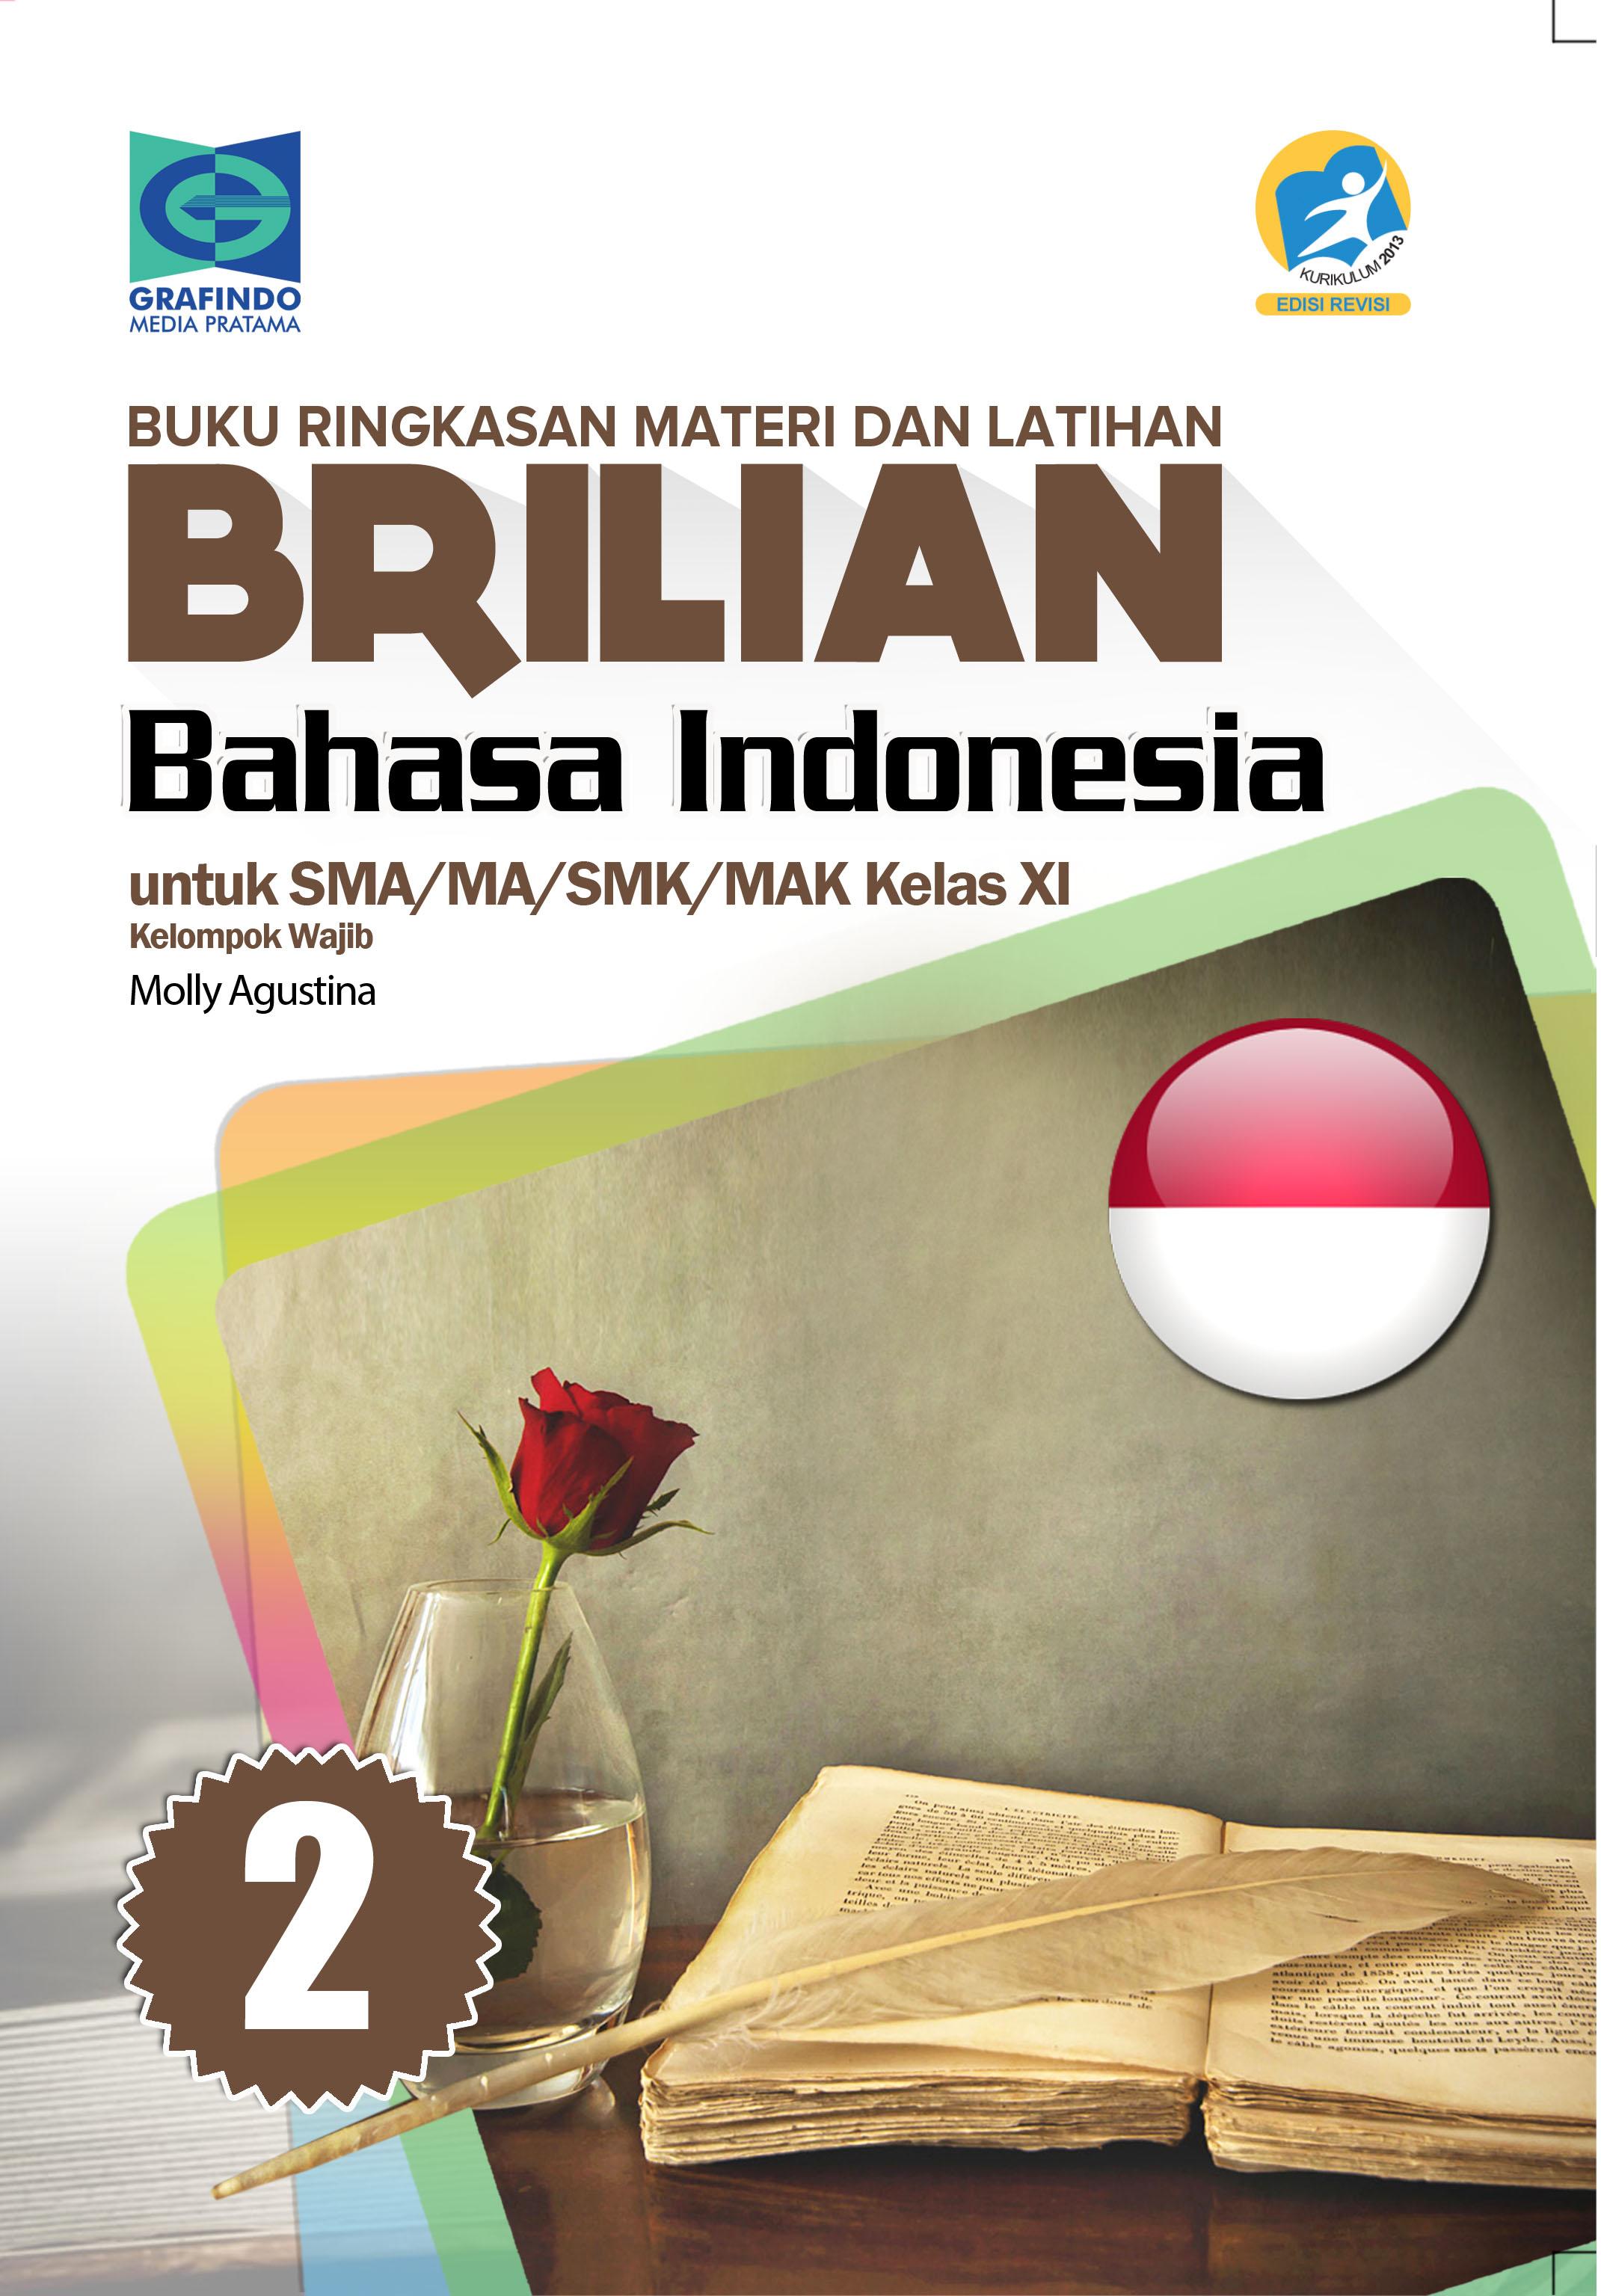 E Book Buku Ringkasan Materi Dan Latihan Brilian Bahasa Indonesia Xi Grafindo Media Pratama